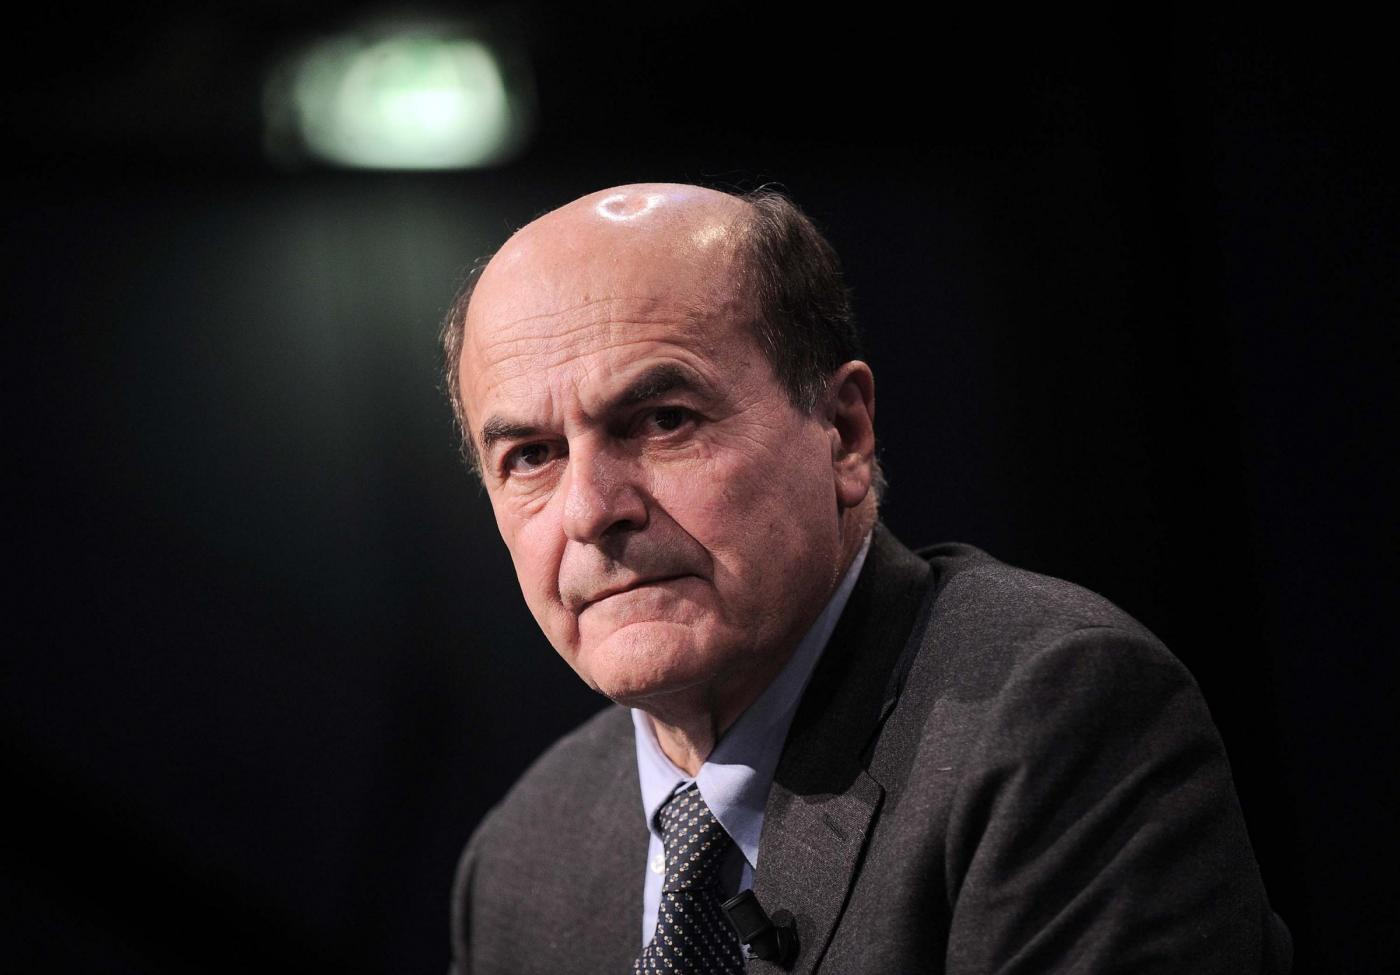 Se Bersani cita Craxi per attaccare Renzi